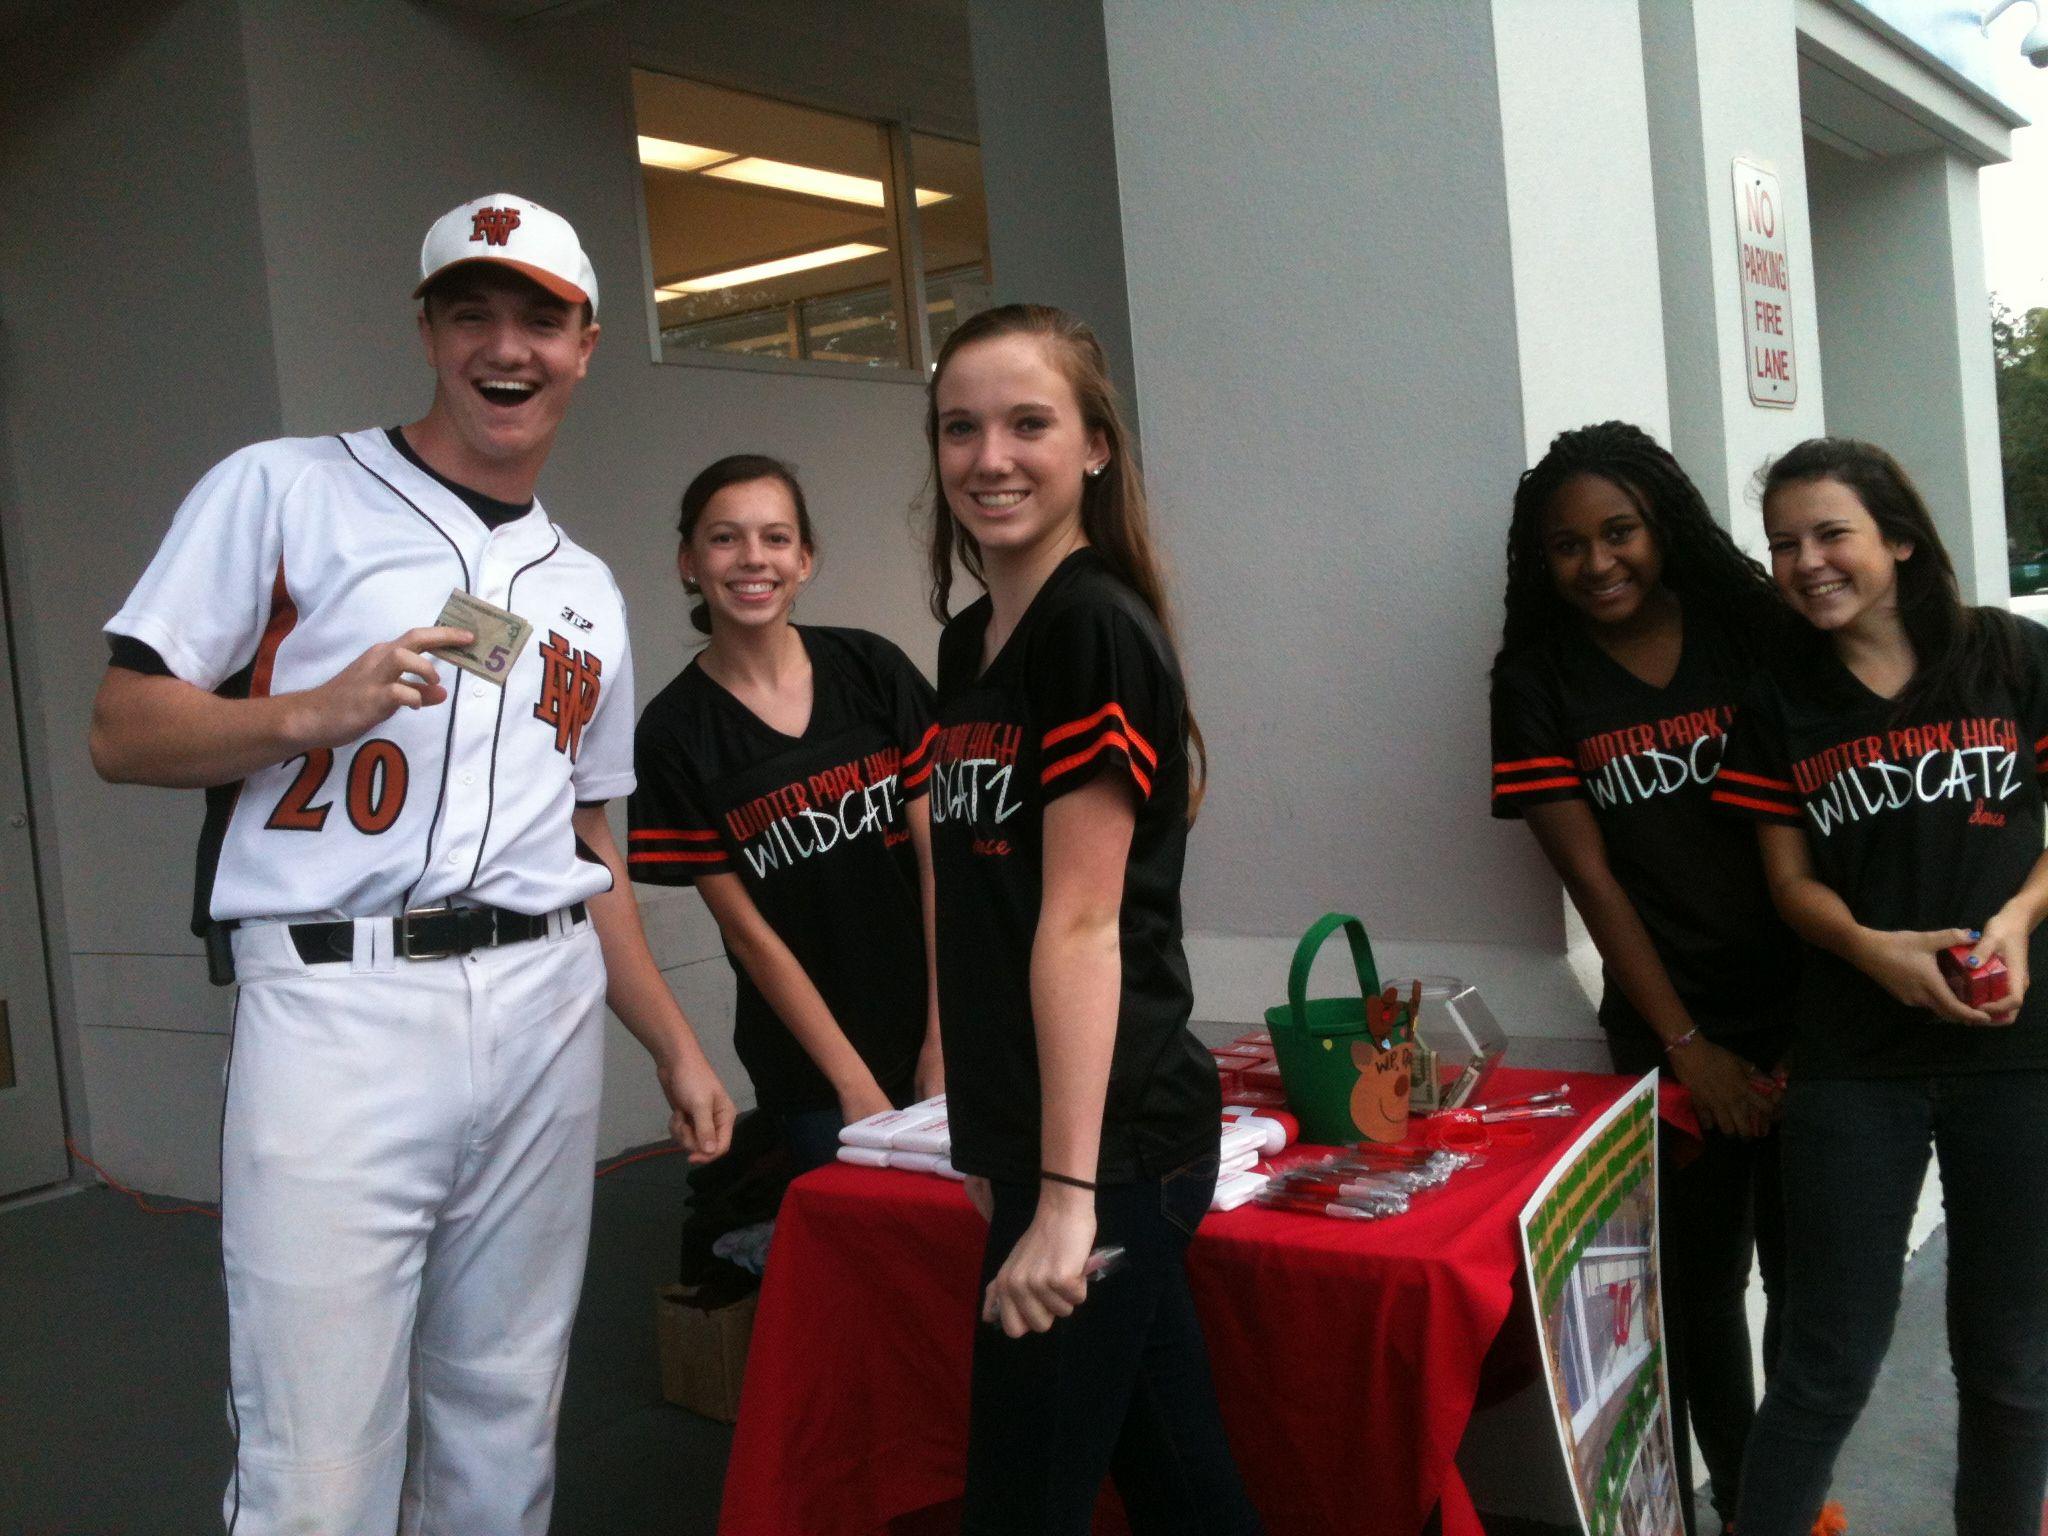 The Varsity Baseball Team And Dance Team Doing Their Thing At The Walgreens The Varsity Dance Teams Baseball Team